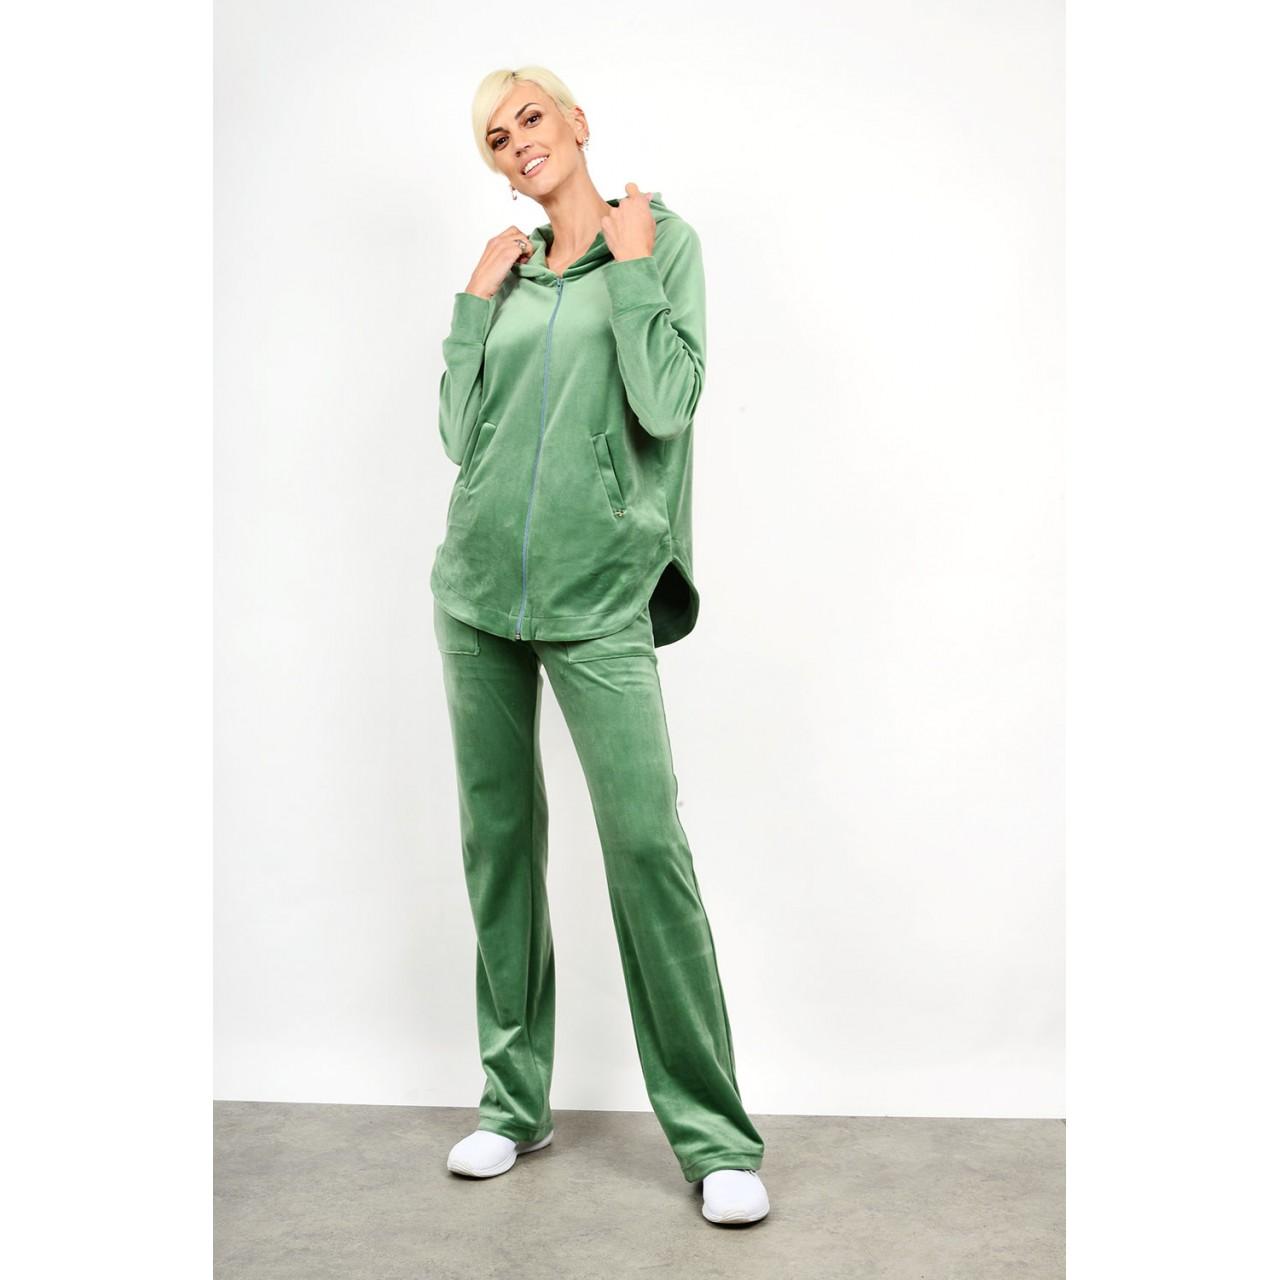 Velvet set cardigan with pant